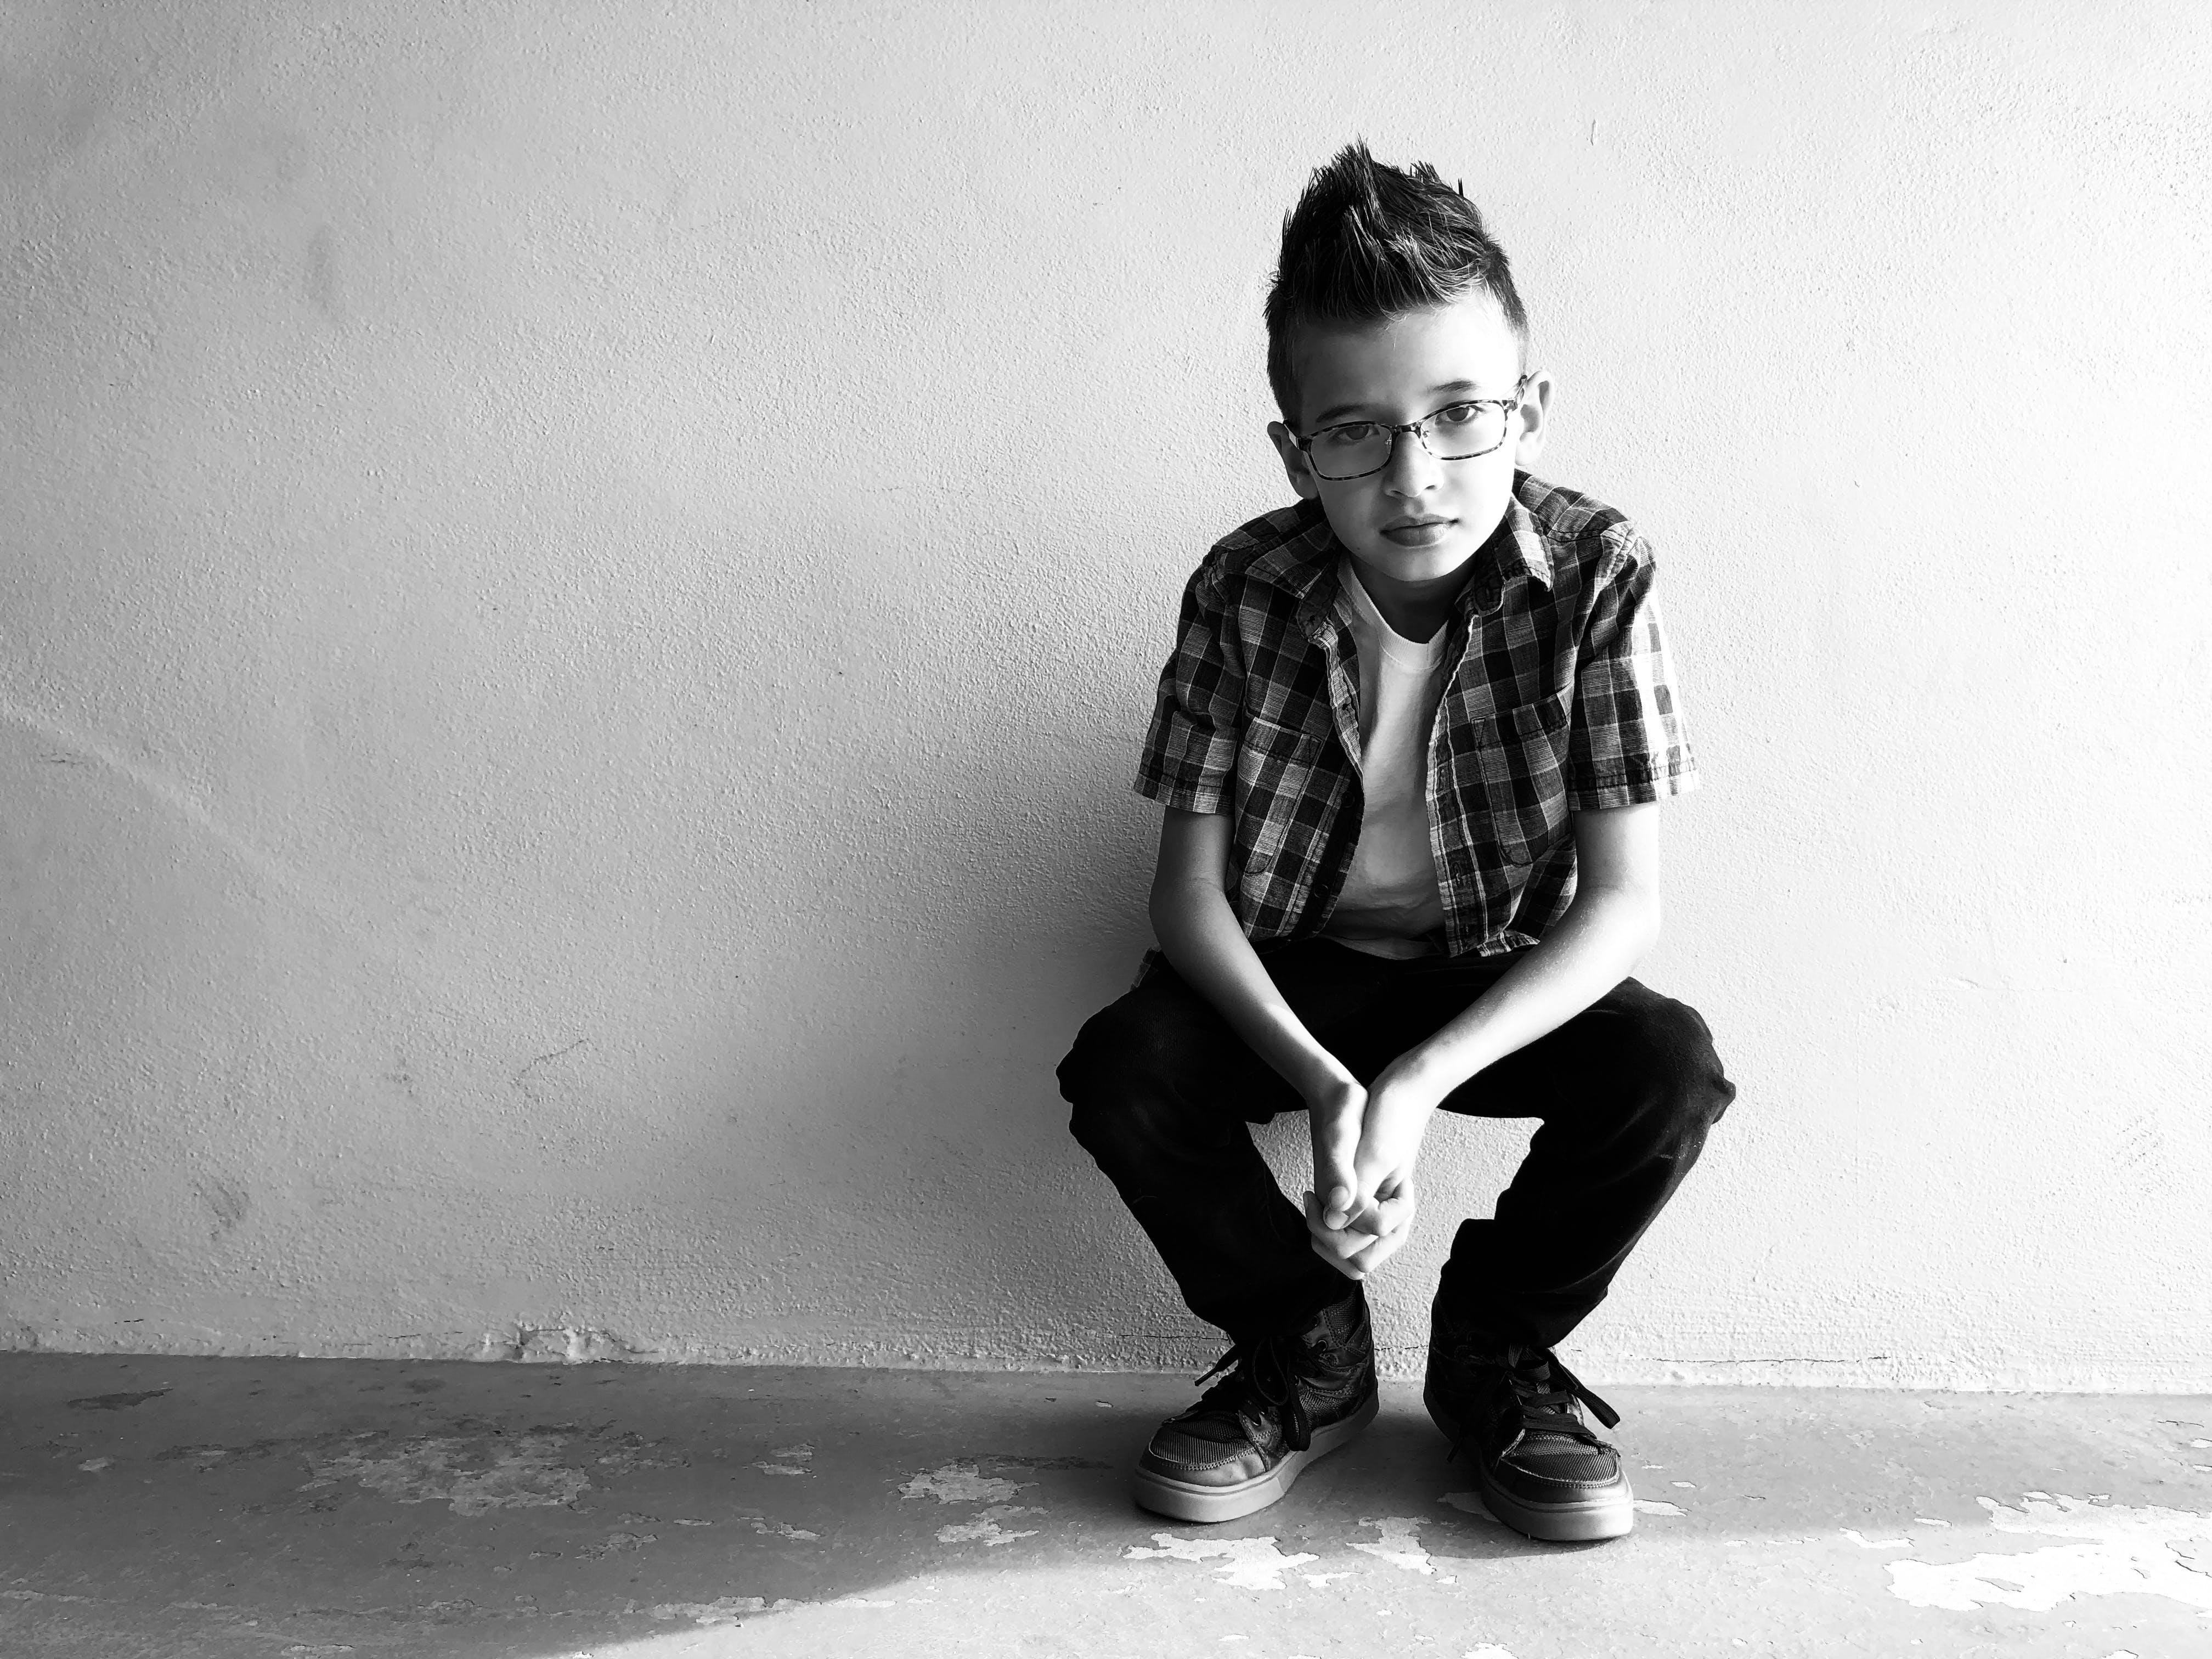 Greyscale Photo Of Boy